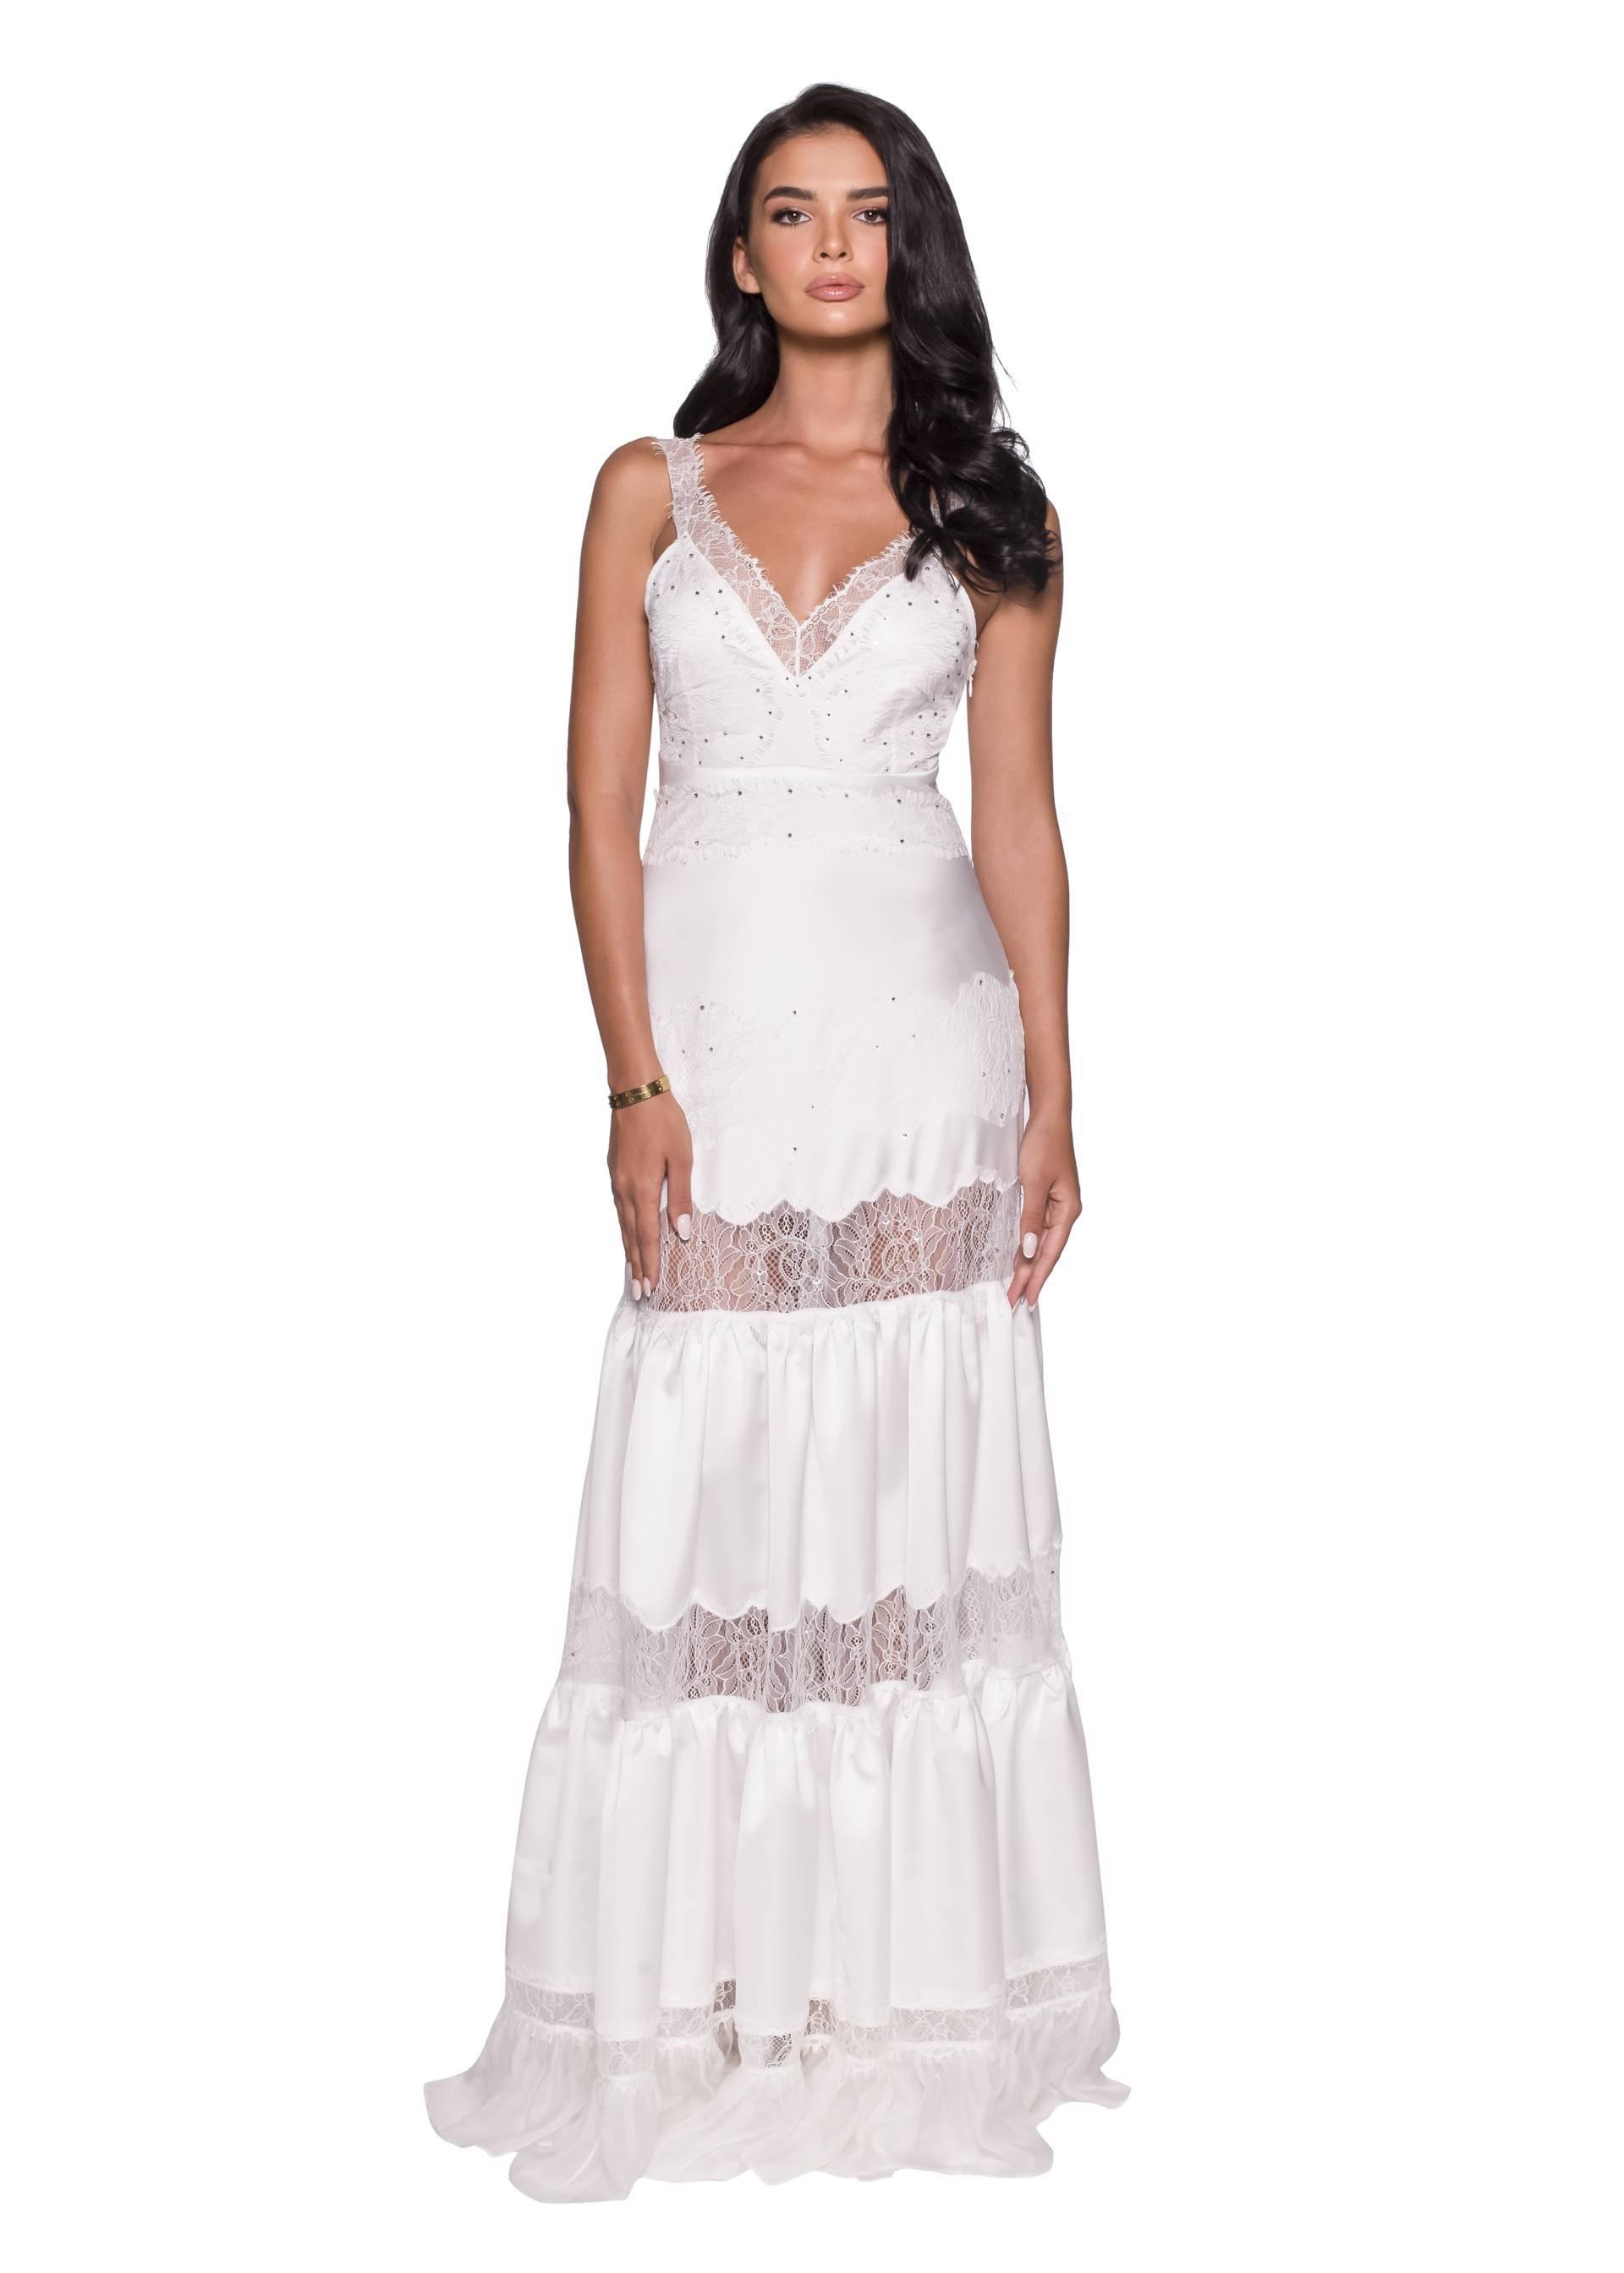 1791f3db38 Bohemian Wedding Dress • Online Shop | Women's clothing | Fashion ...